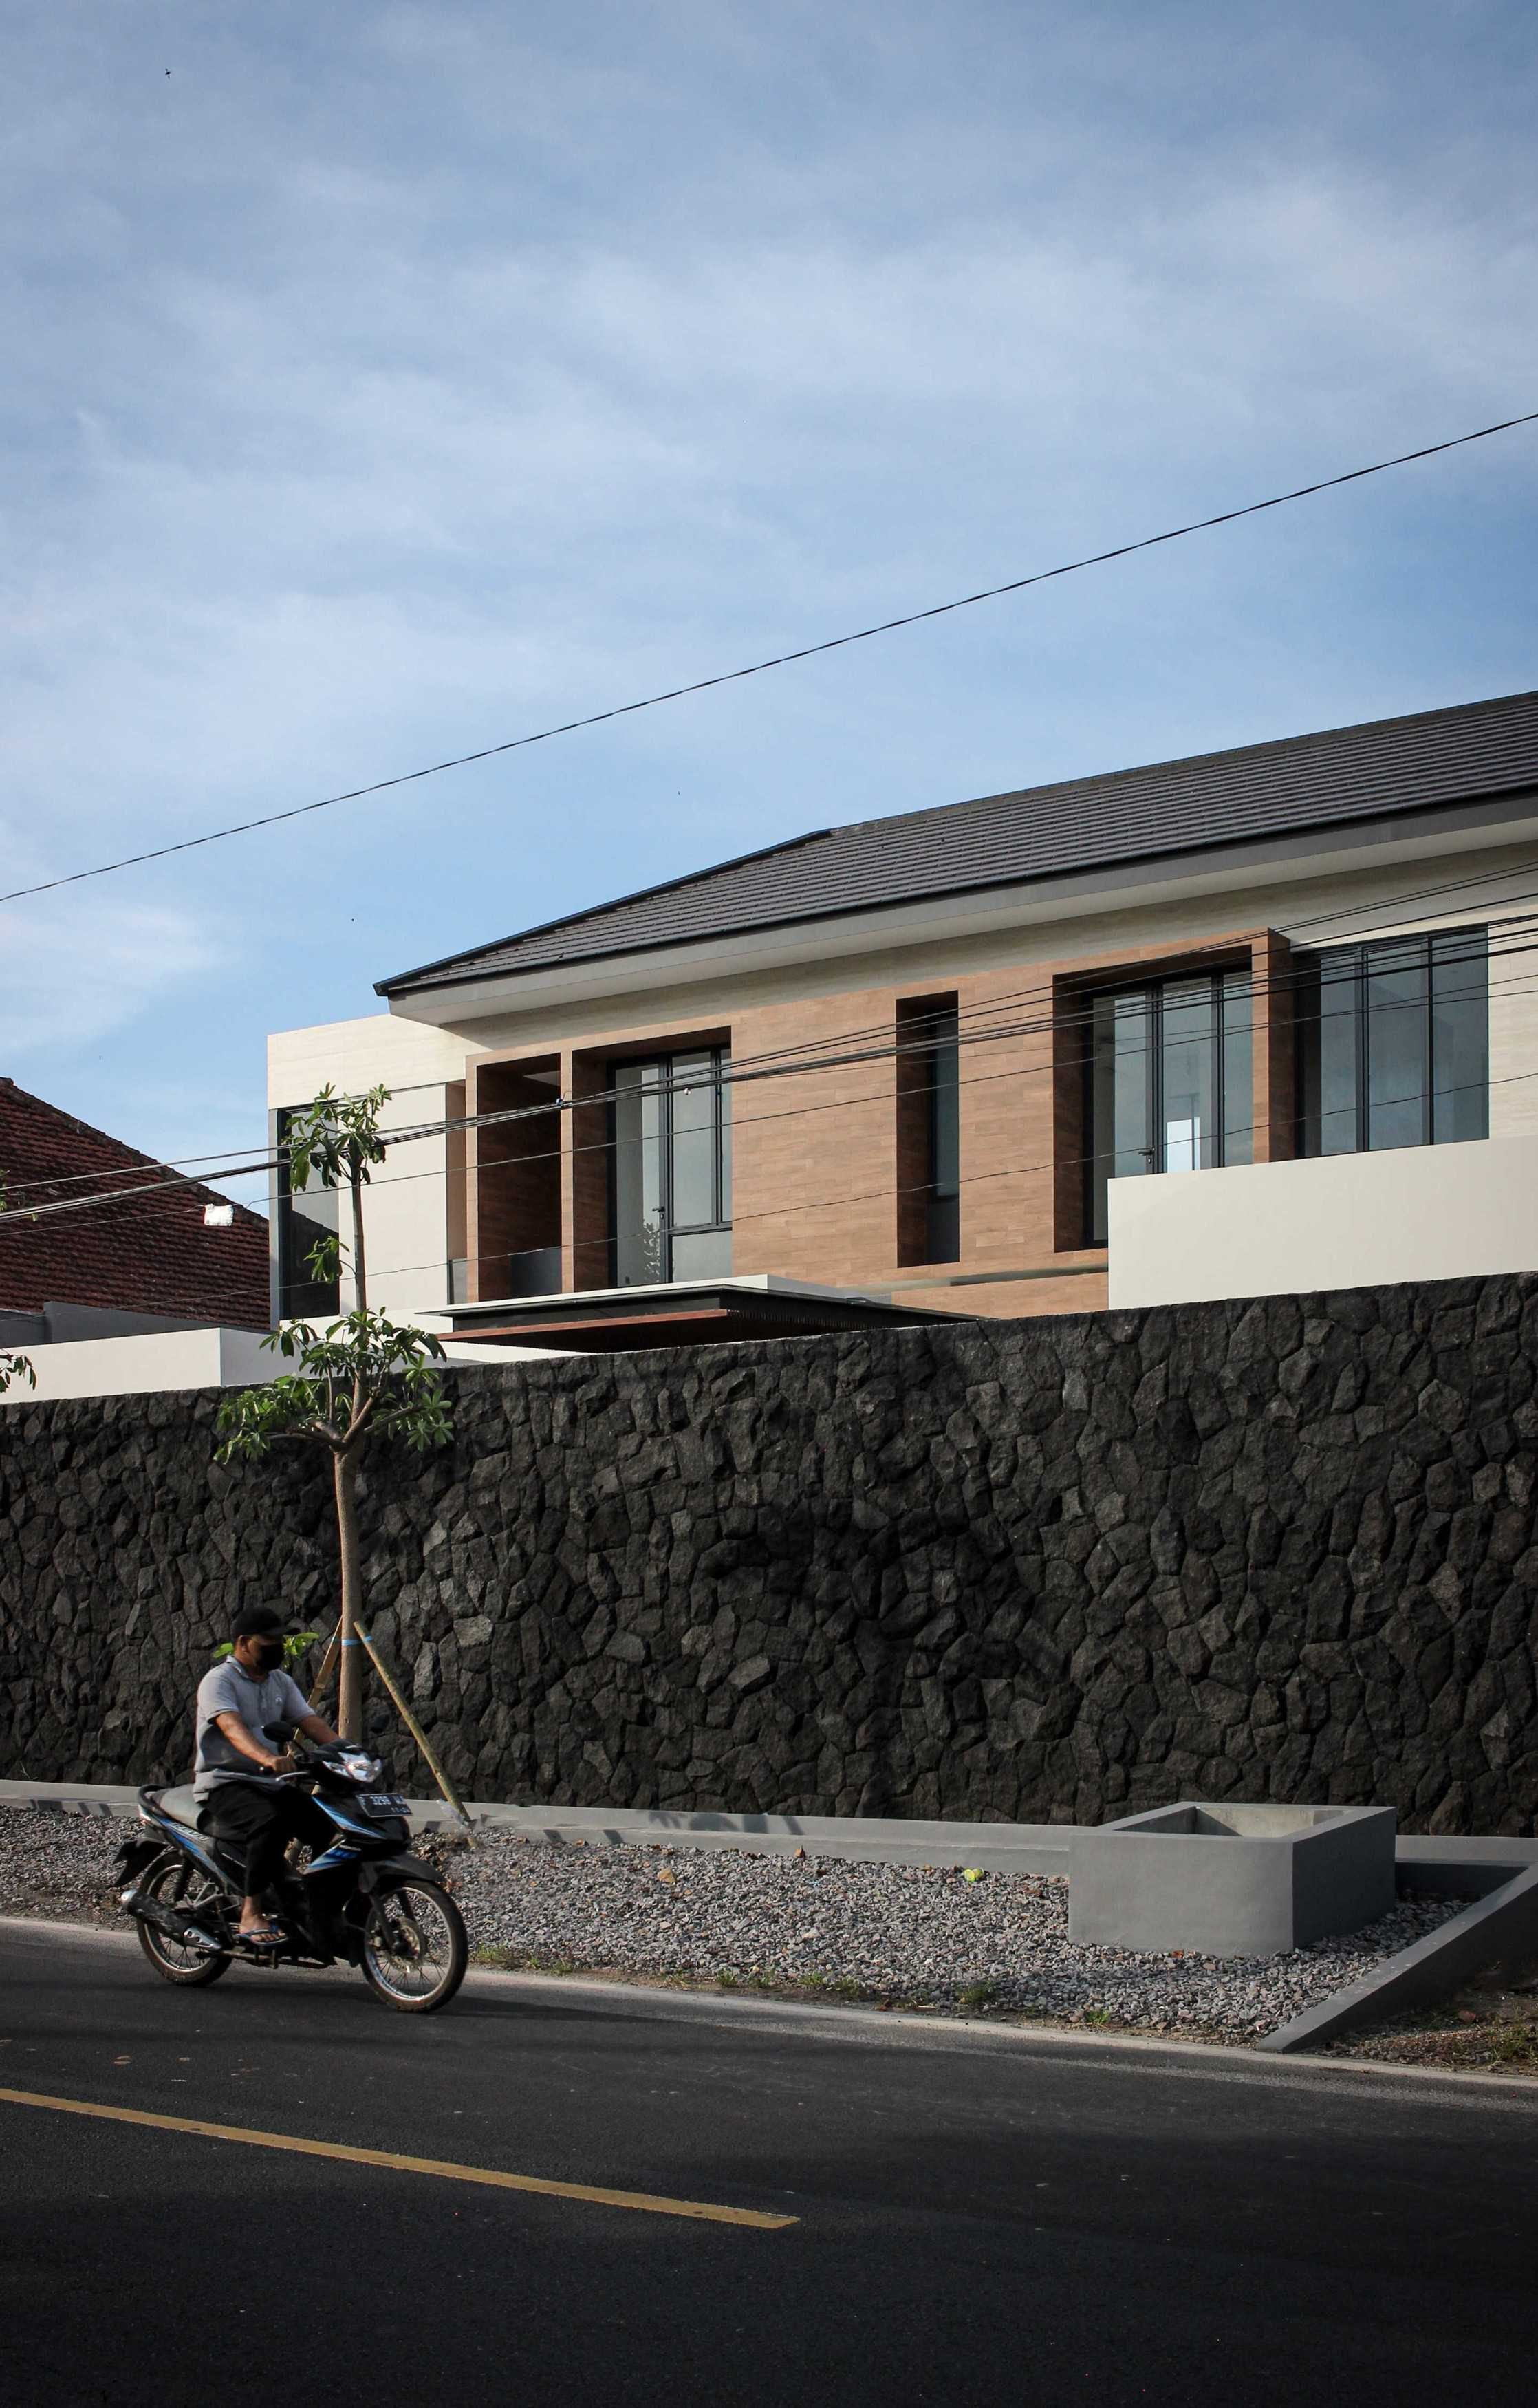 Y0 Design Architect S House Kec. Srono, Kabupaten Banyuwangi, Jawa Timur, Indonesia Kec. Srono, Kabupaten Banyuwangi, Jawa Timur, Indonesia Yohanes-Iswara-Limandjaya-S-House   121071